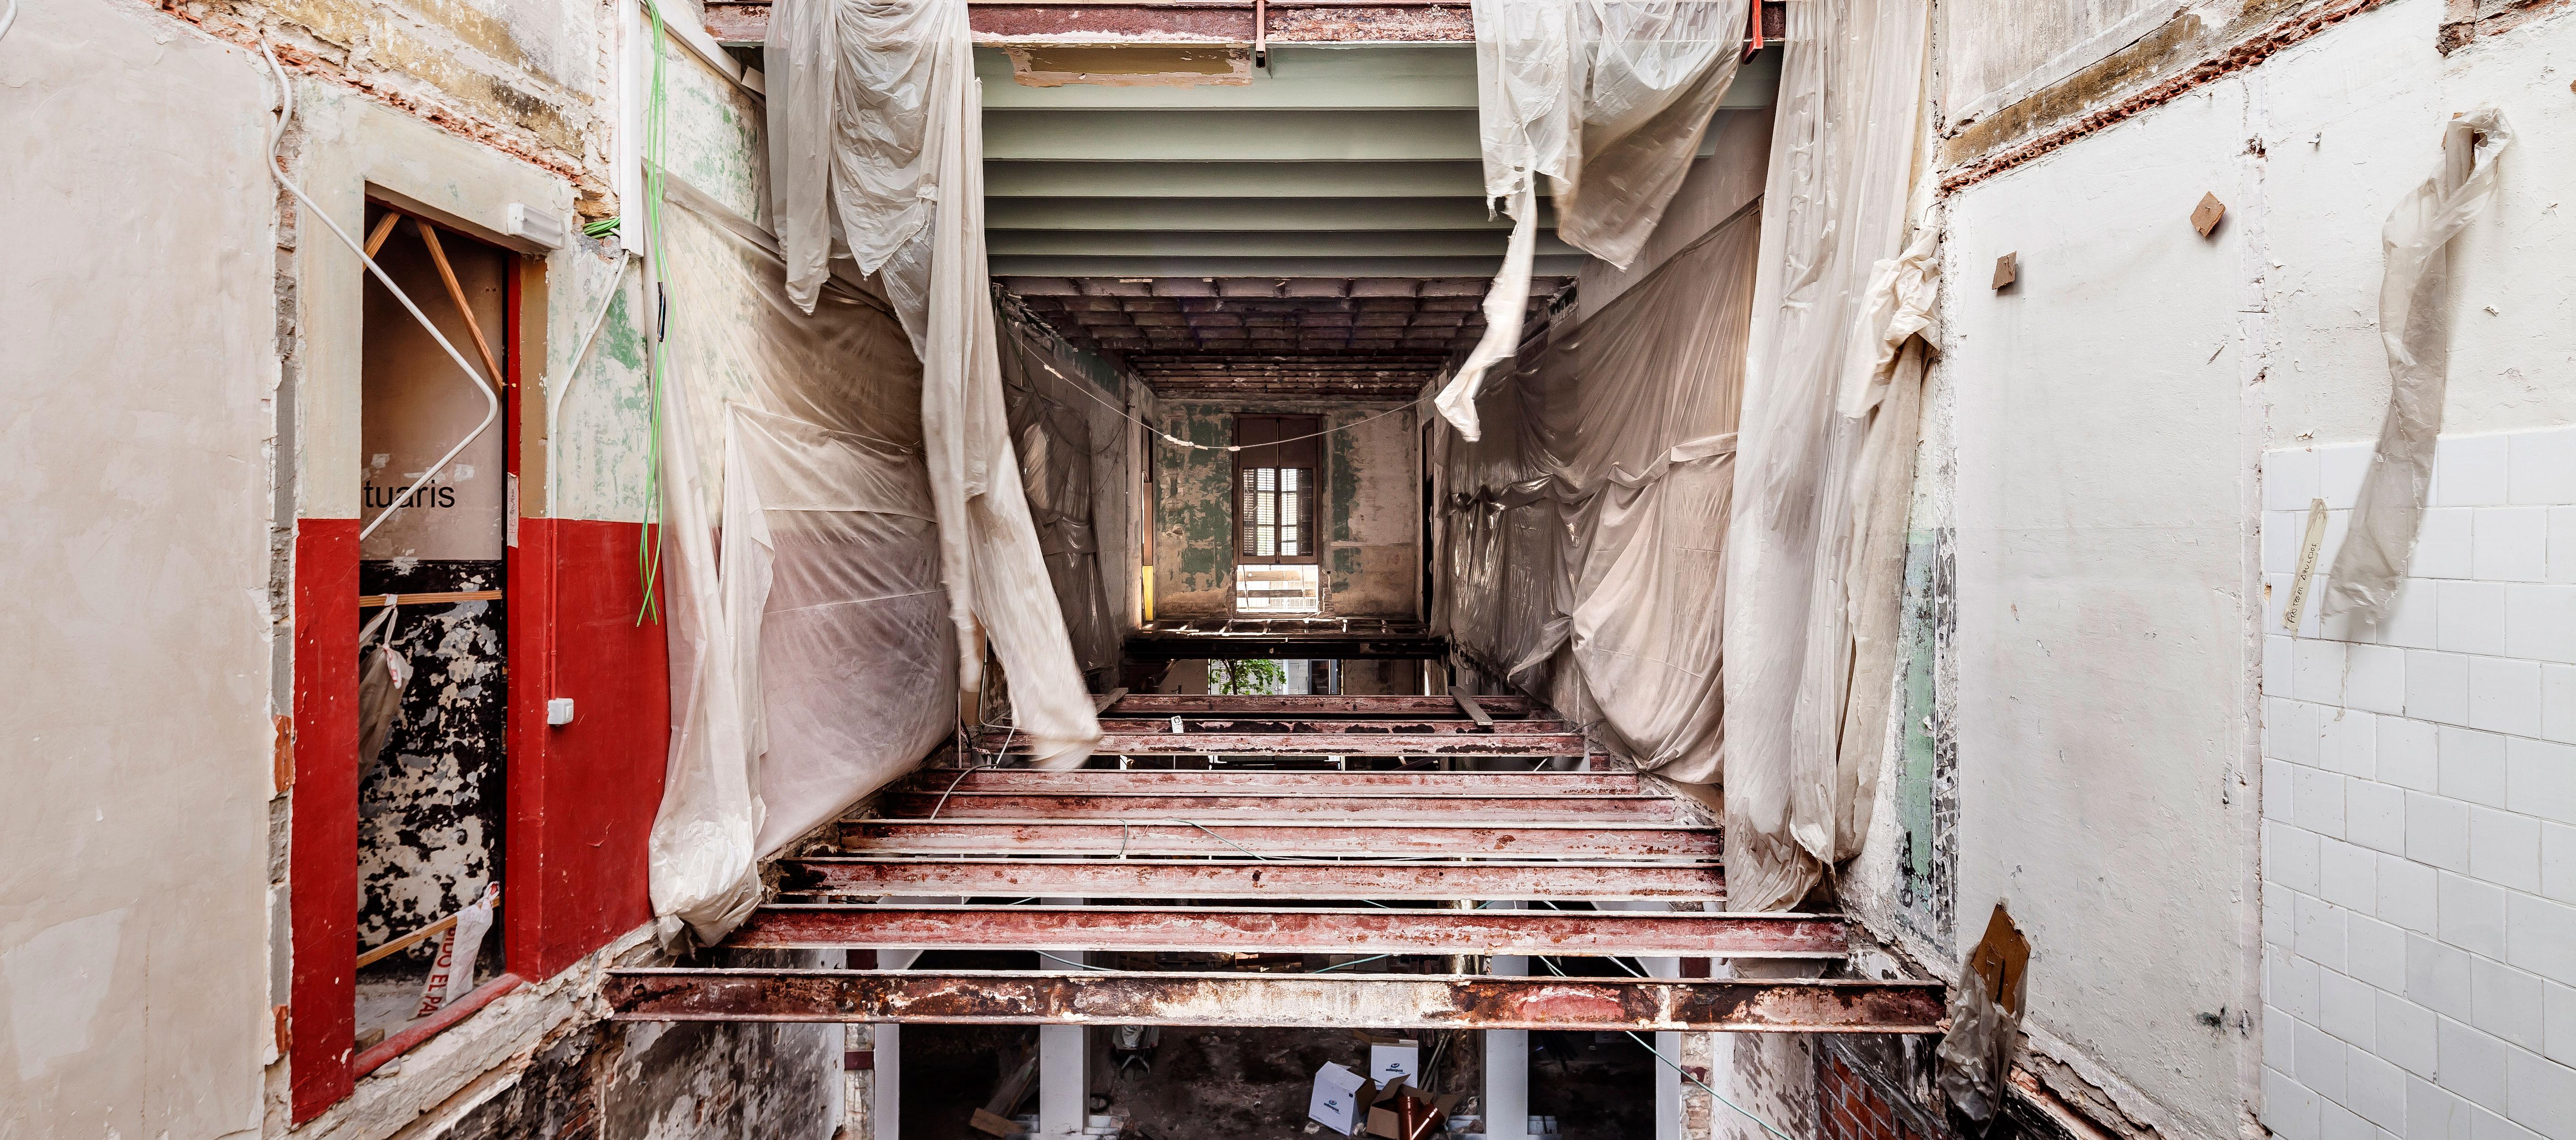 Re-edificatoria por Adrià Goula. Unfinished. Pabellón español de la Bienal de Venecia 2016. Imagen © Adrià Goula